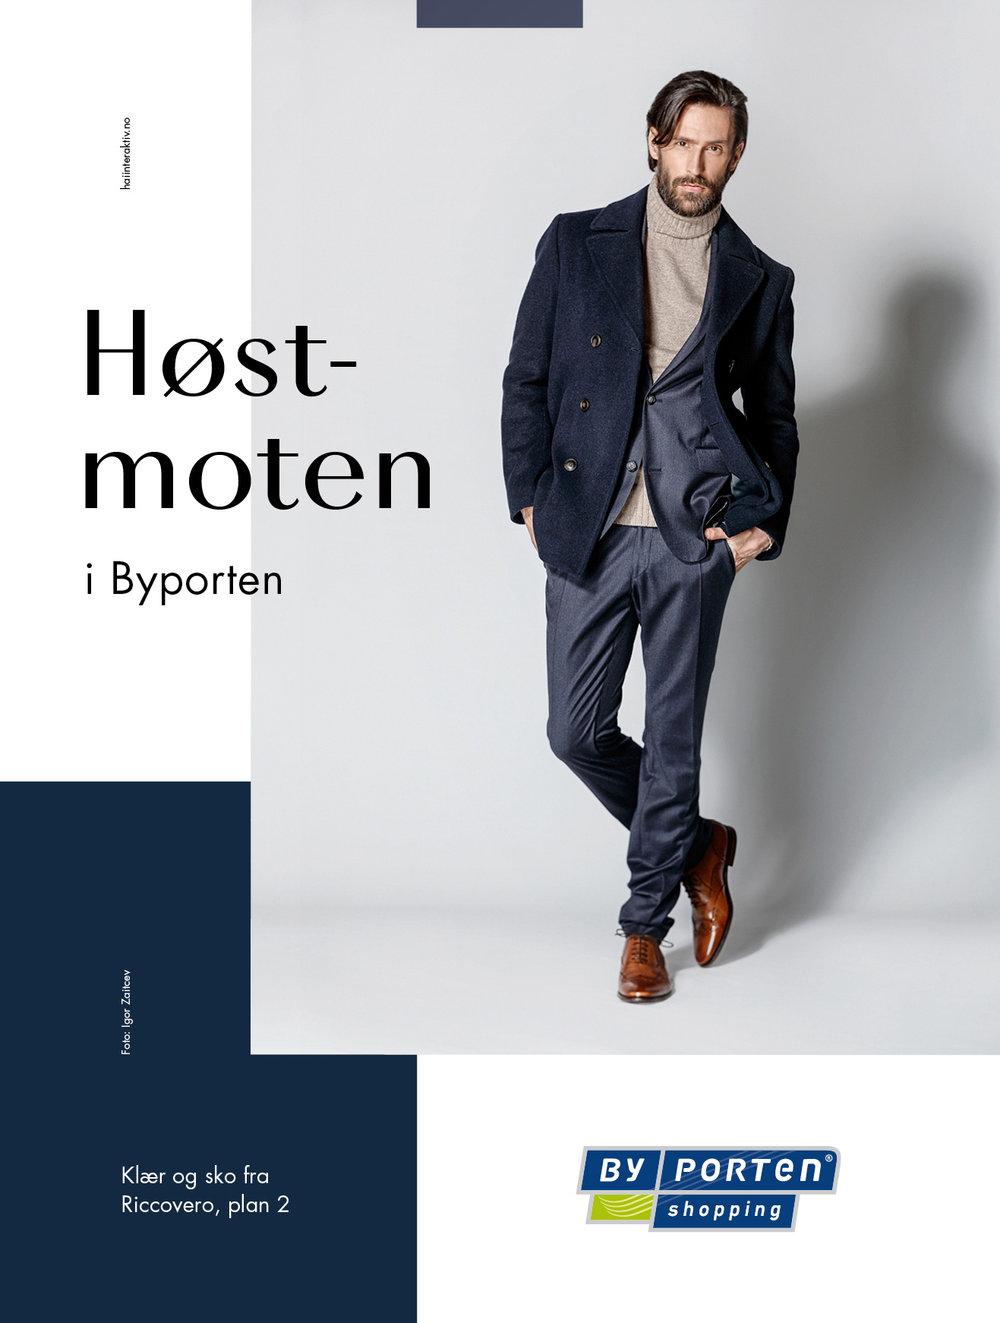 20171018-Høstmoten-COSTUME-Herre-1.jpg